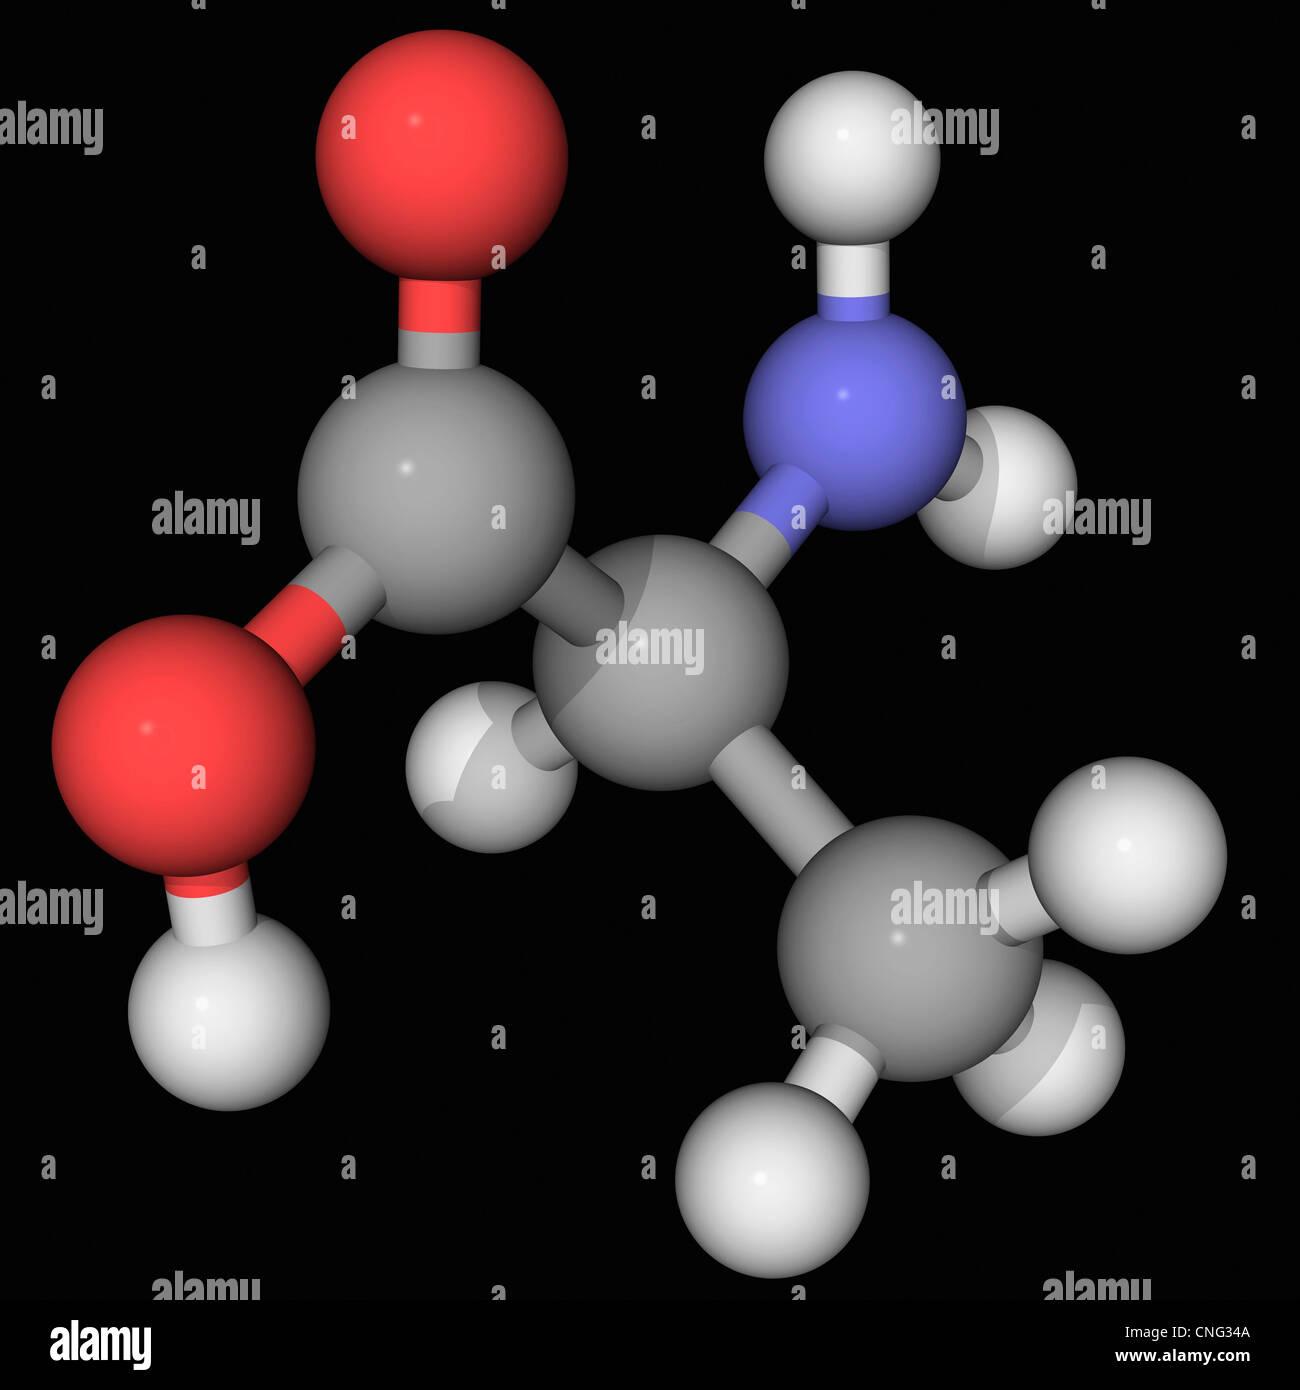 Alanin-Molekül Stockbild